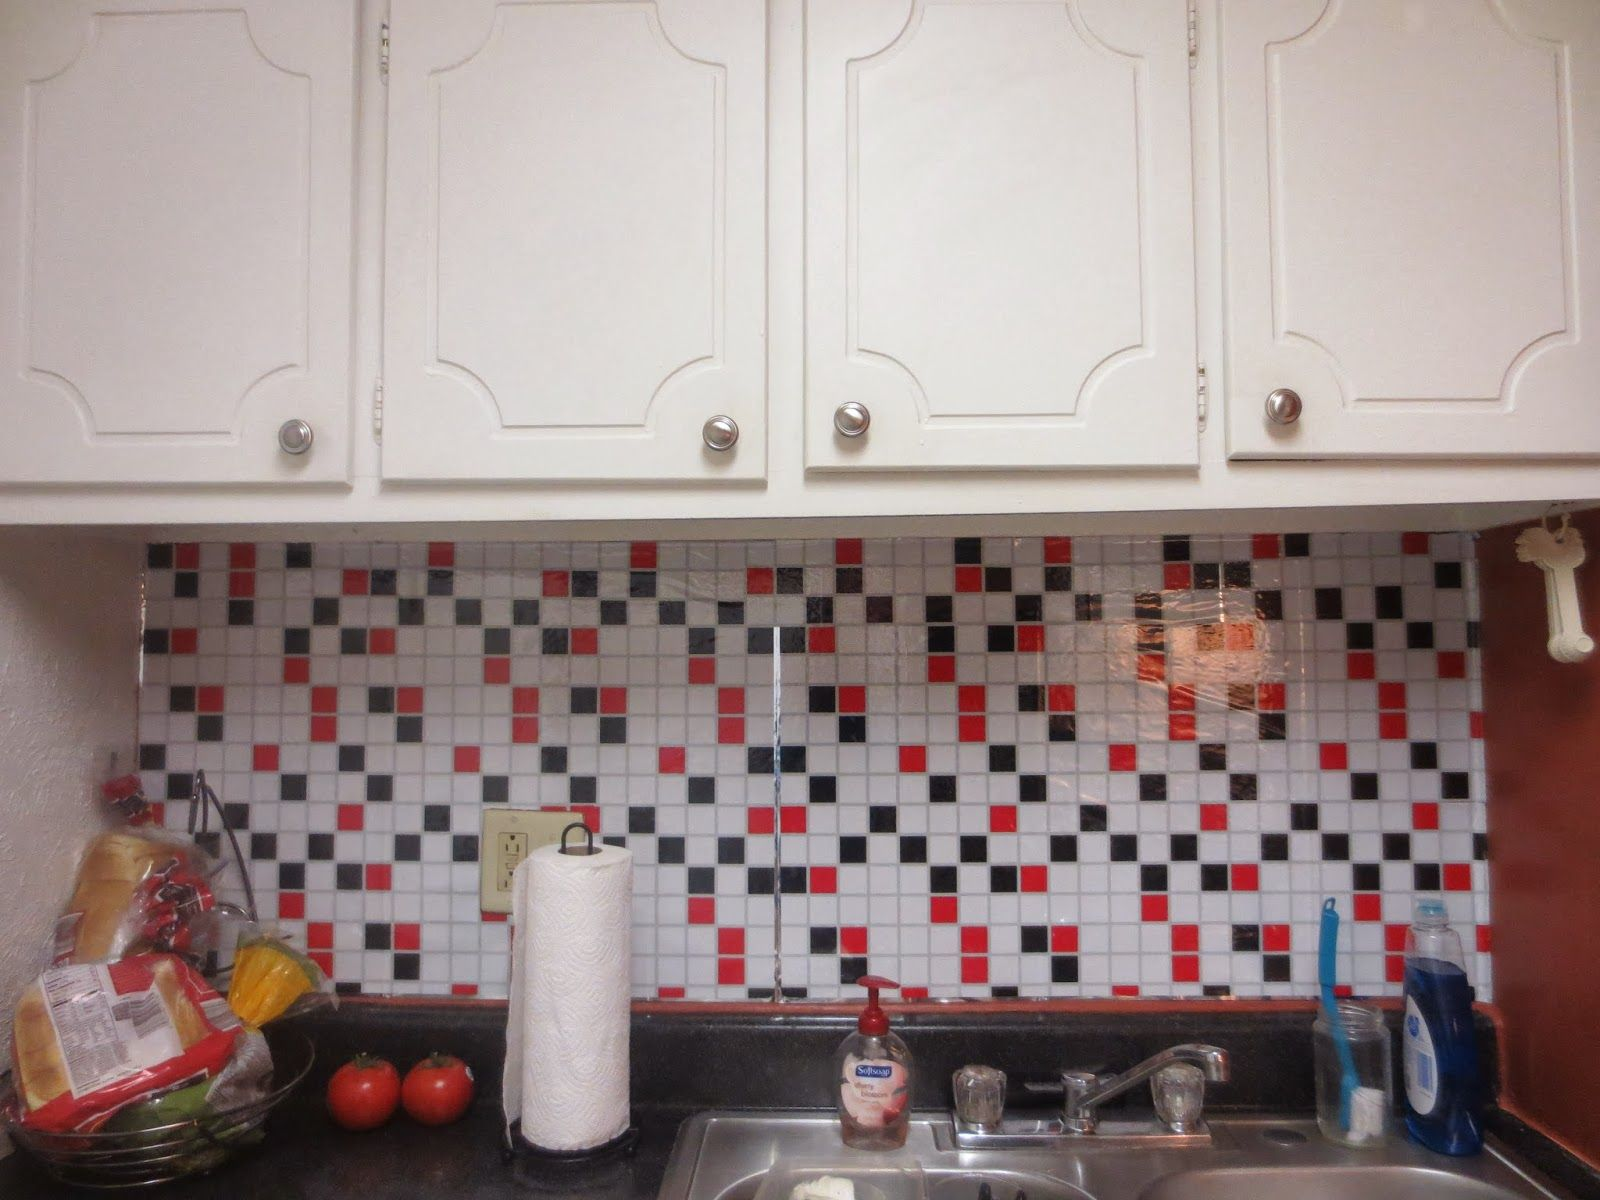 Best Kitchen Gallery: Dollar Tree Backsplash Room Decorating Ideas Pinterest Room of Foil Kitchen Tile on rachelxblog.com